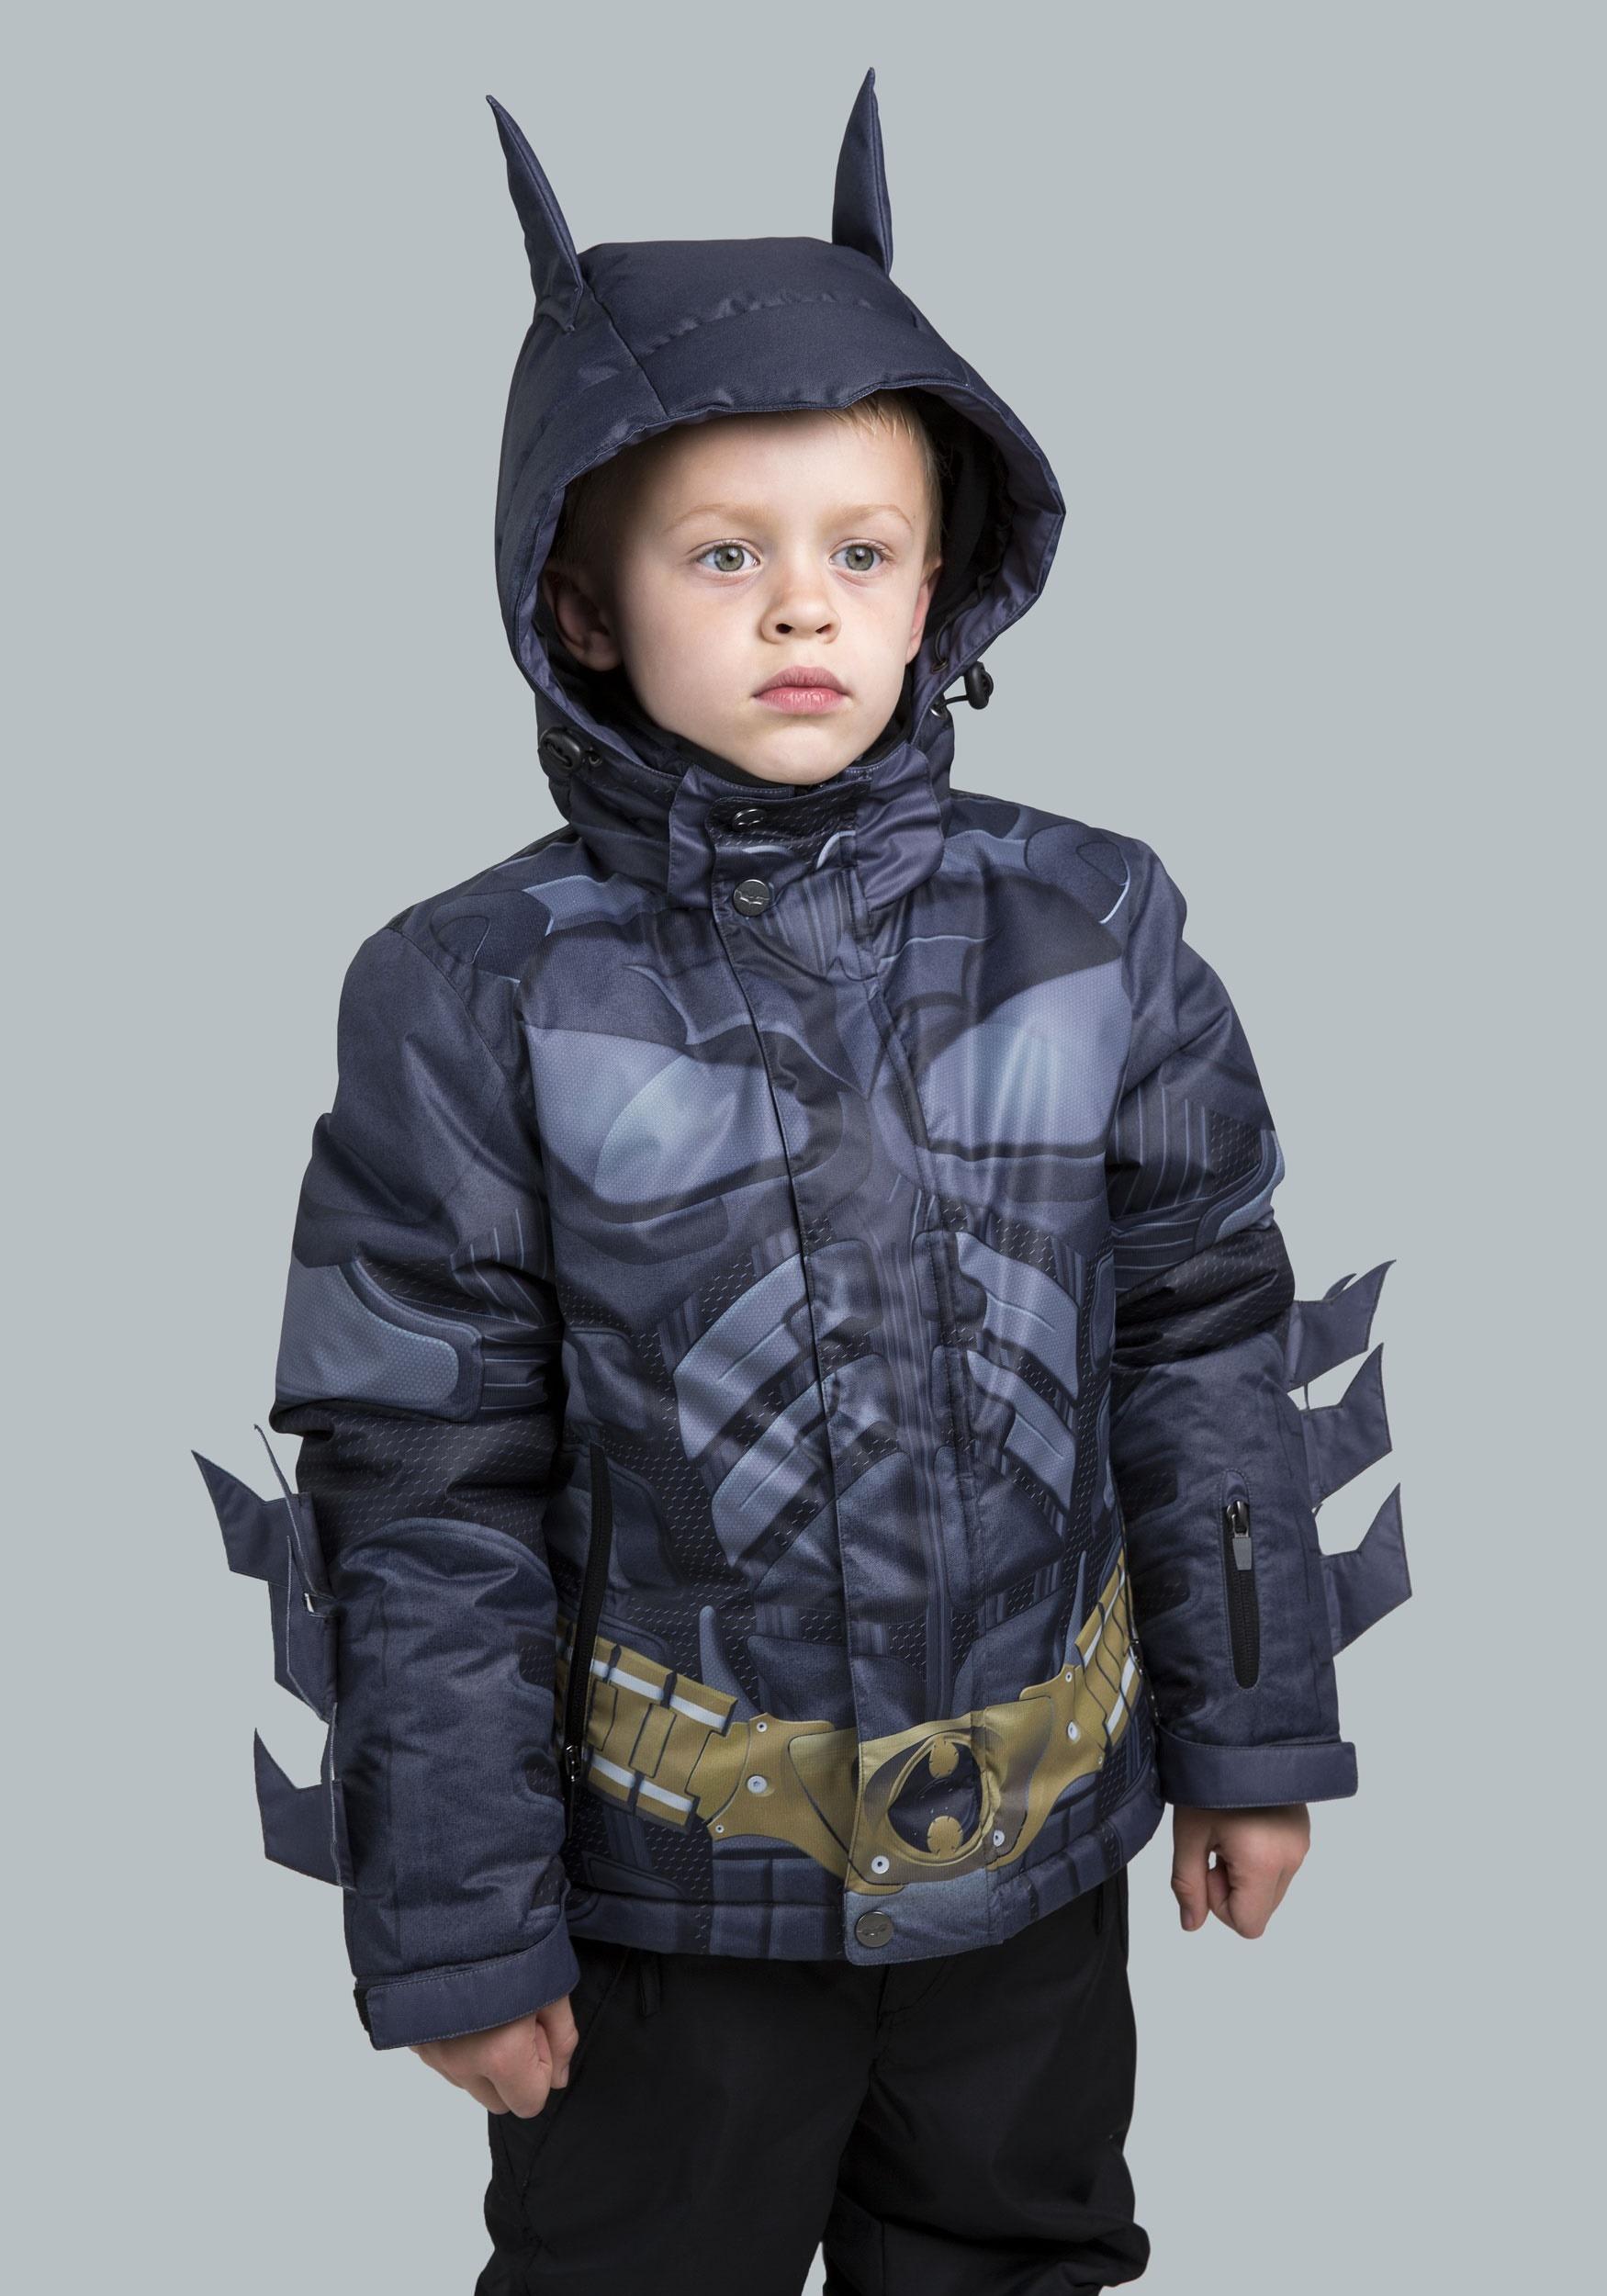 Black Panther Hero Costume